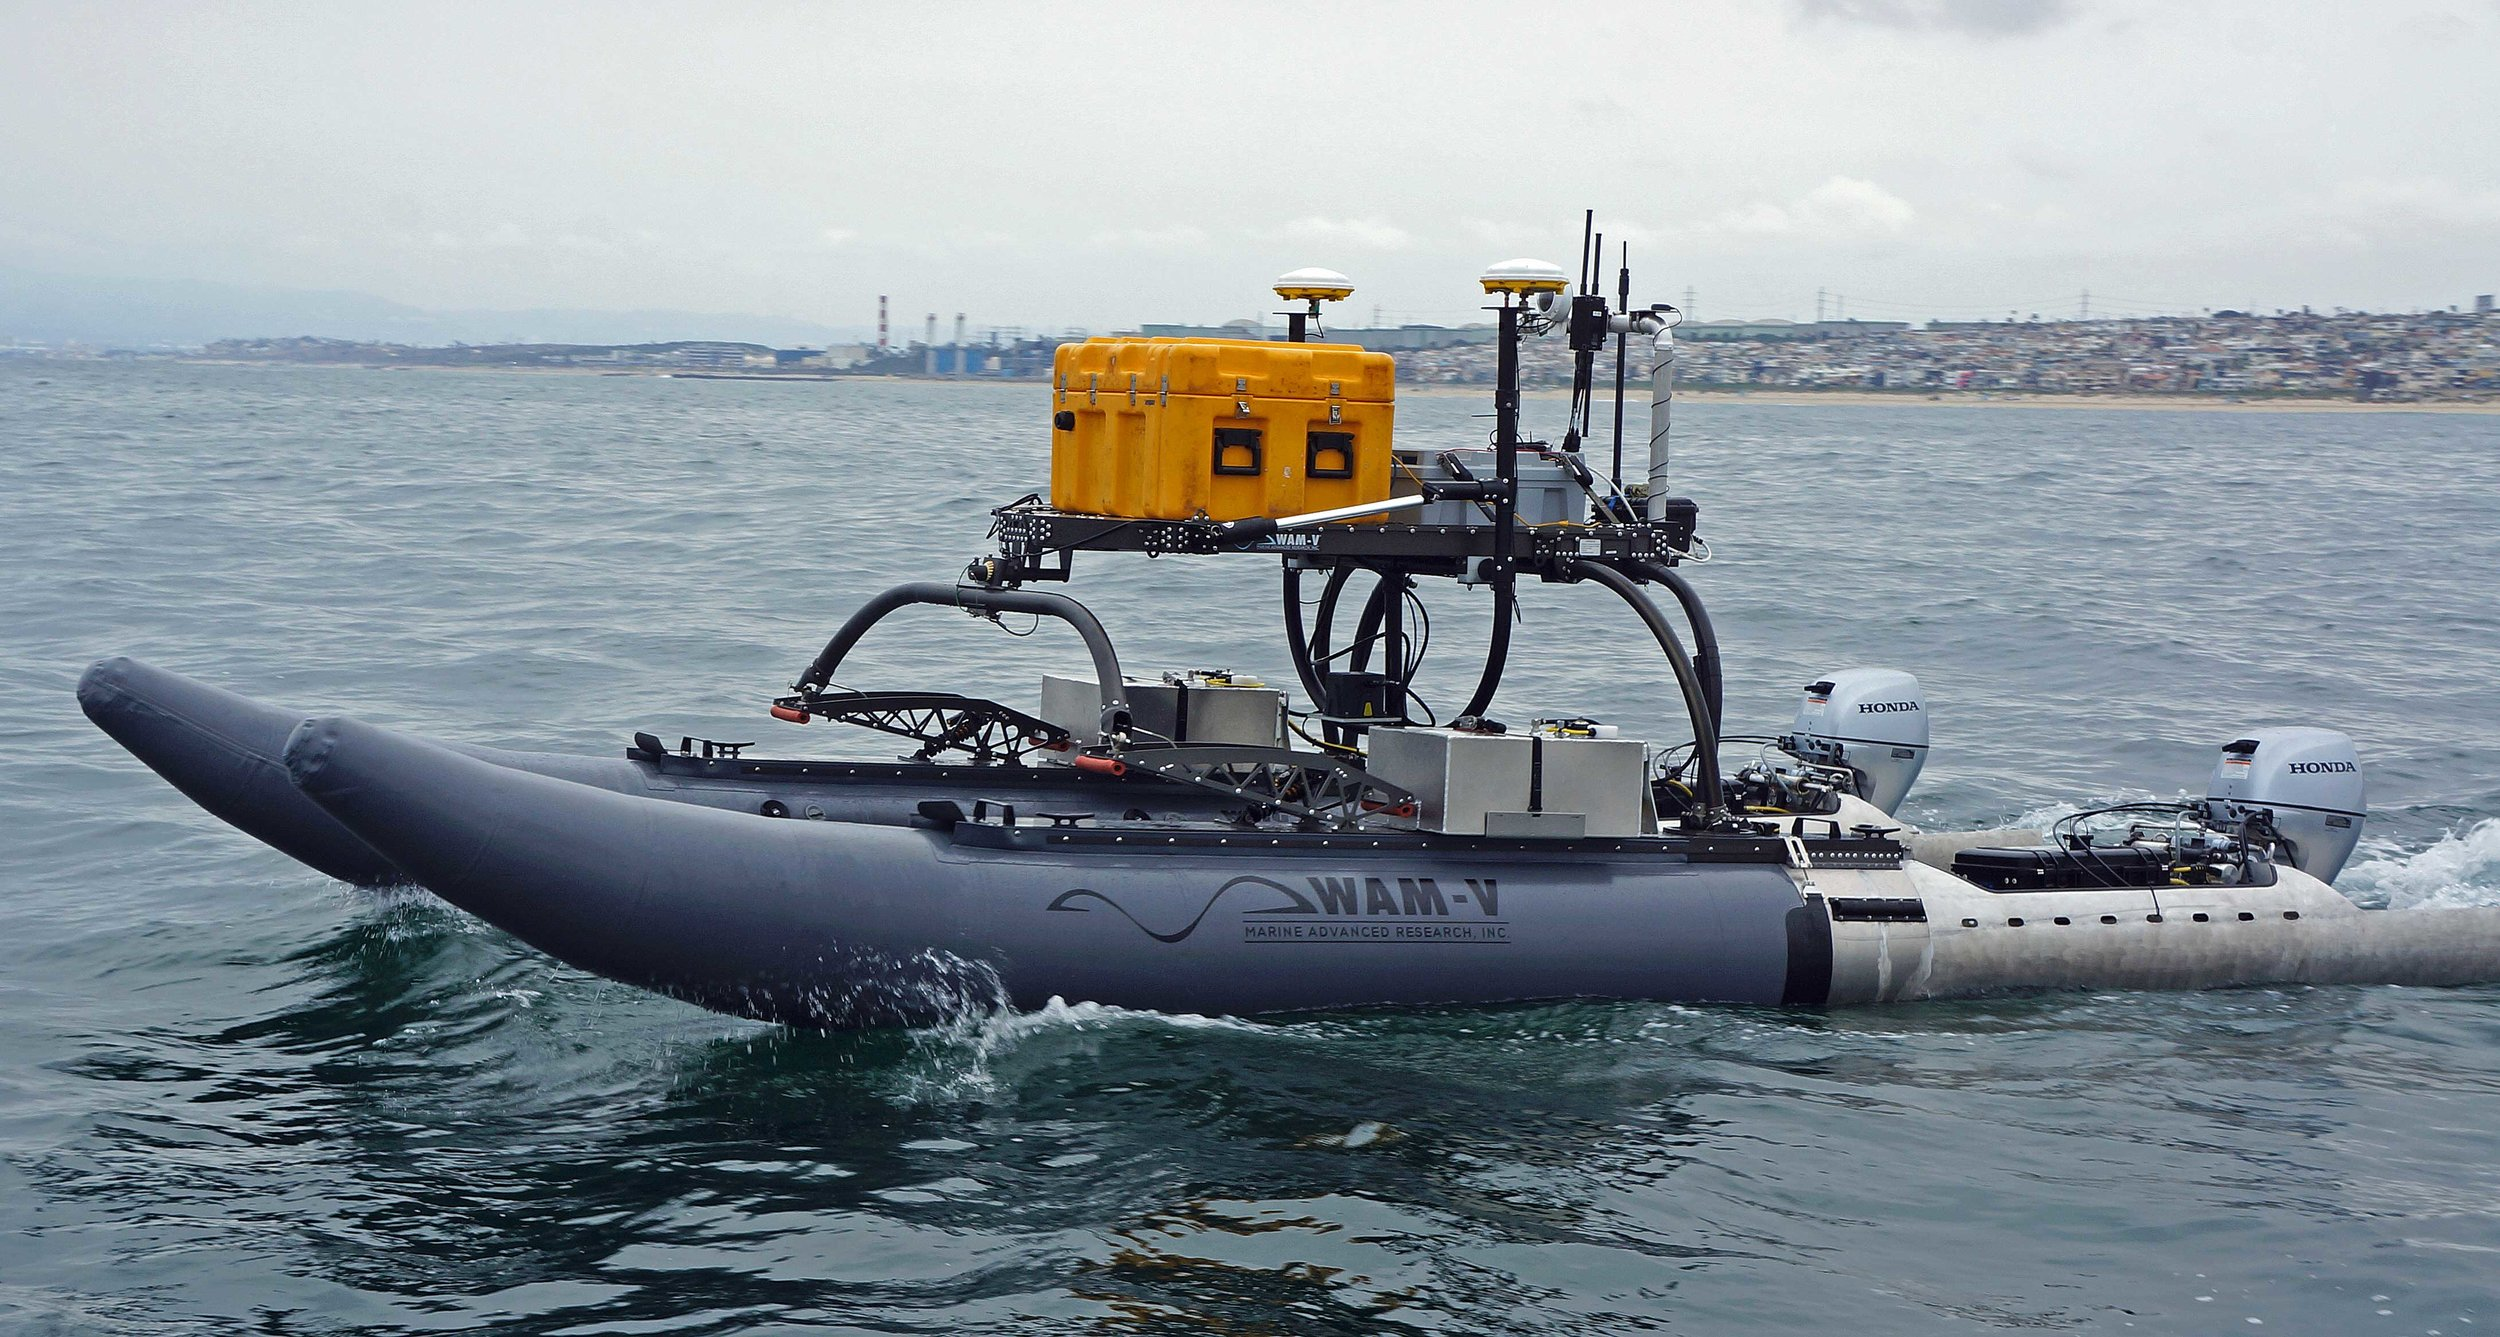 WAM-V 20 ASV for Hydrographic Survey